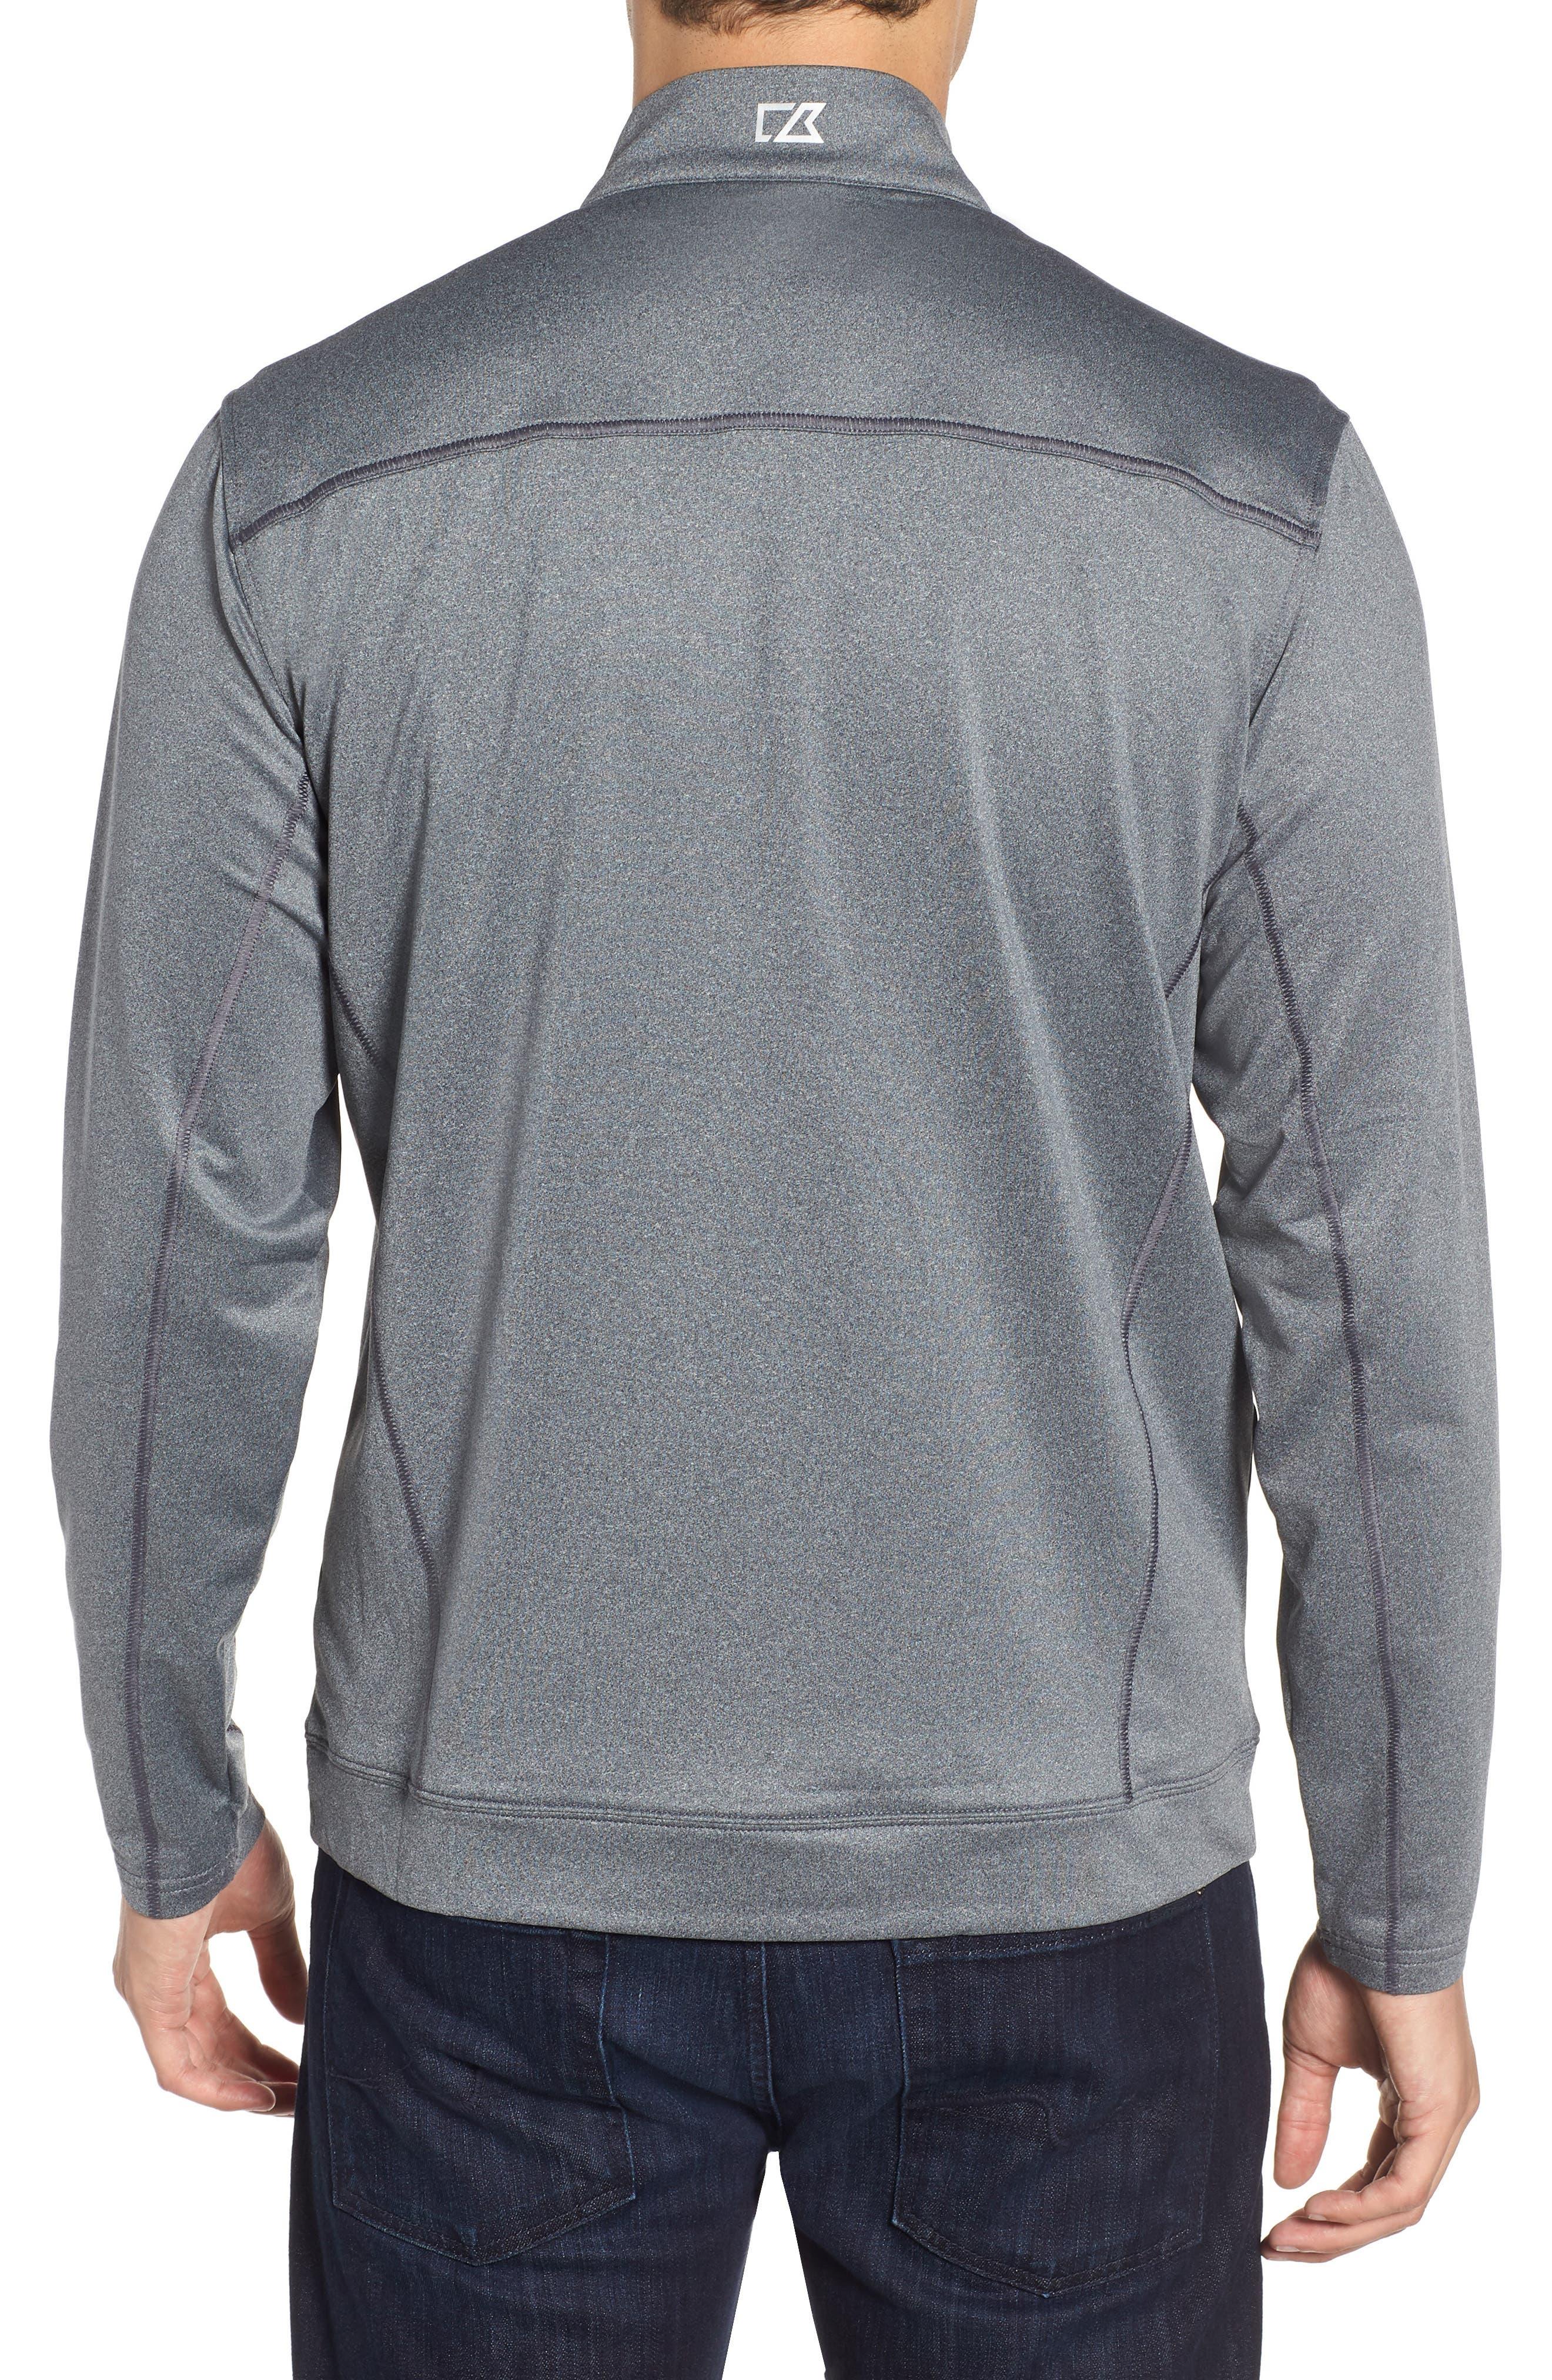 Endurance Oakland Raiders Regular Fit Pullover,                             Alternate thumbnail 2, color,                             CHARCOAL HEATHER